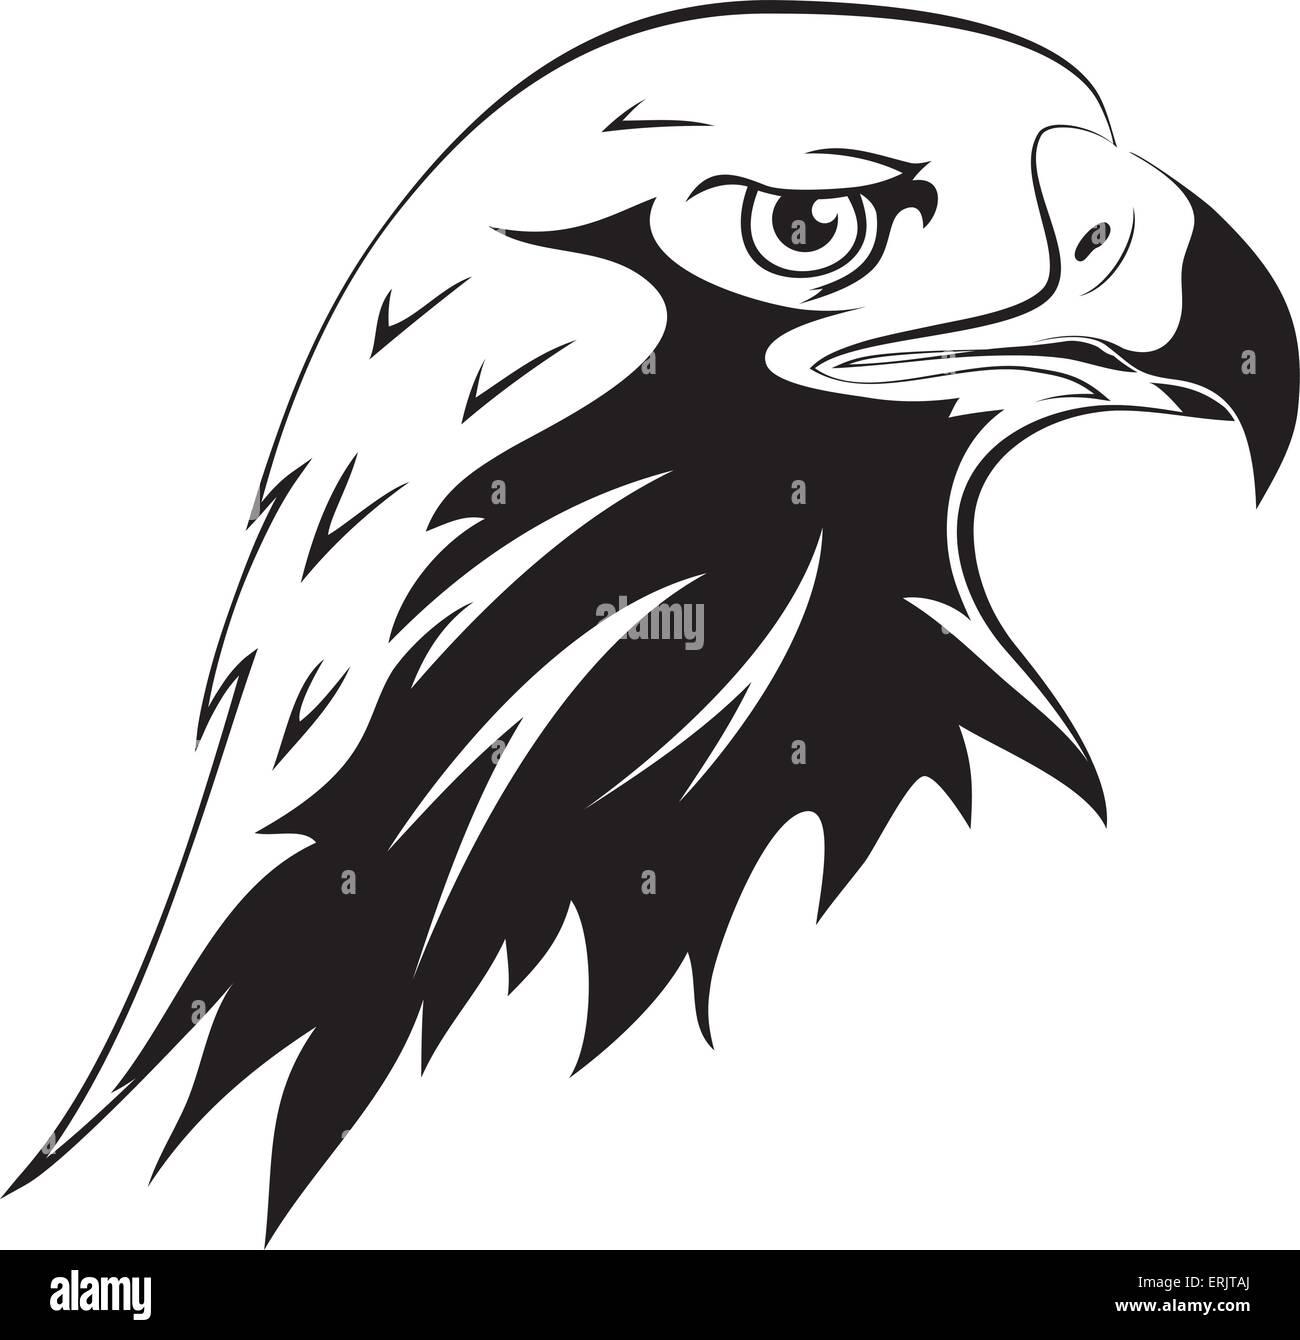 Un depredador salvaje tatuajes vector silueta negra de una cabeza de águila